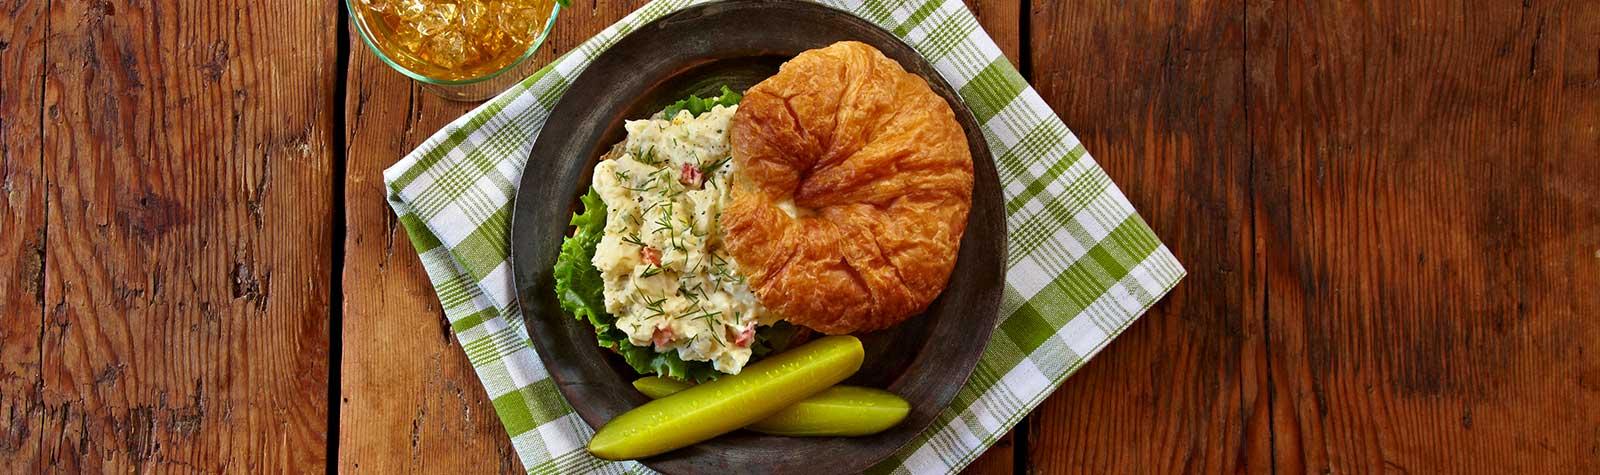 Potato Dill Salad Sandwich